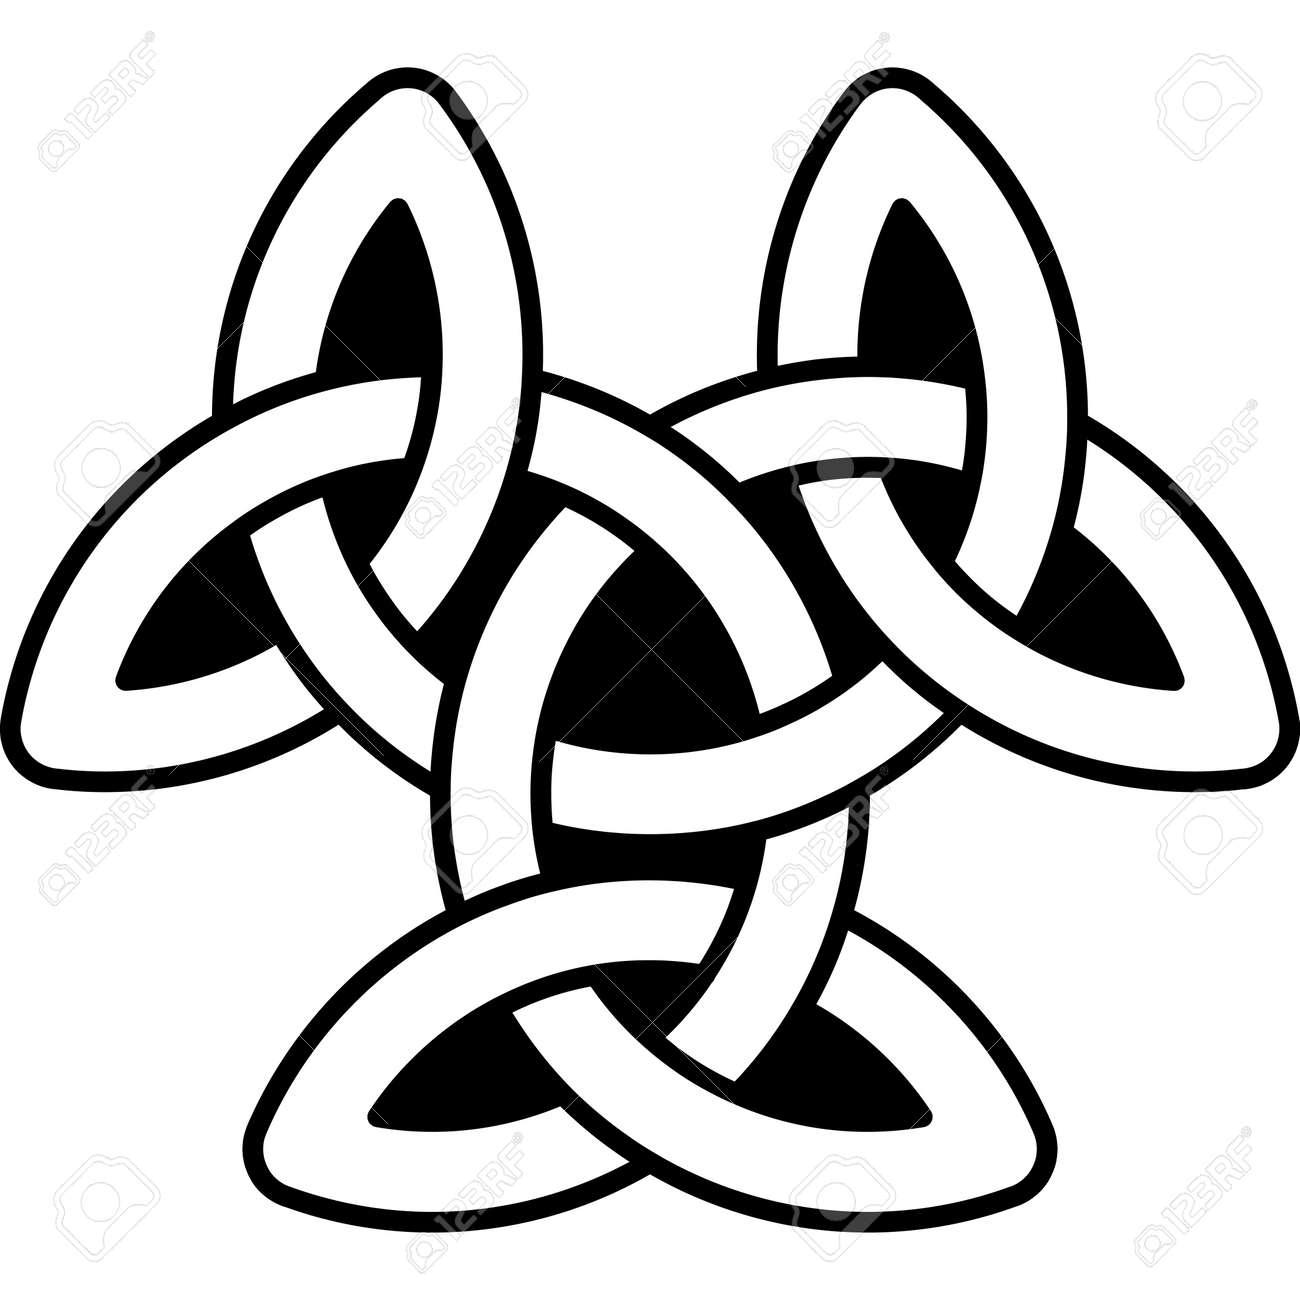 Monochrome Celtic Pattern Pattern For Scandinavian Or Celtic